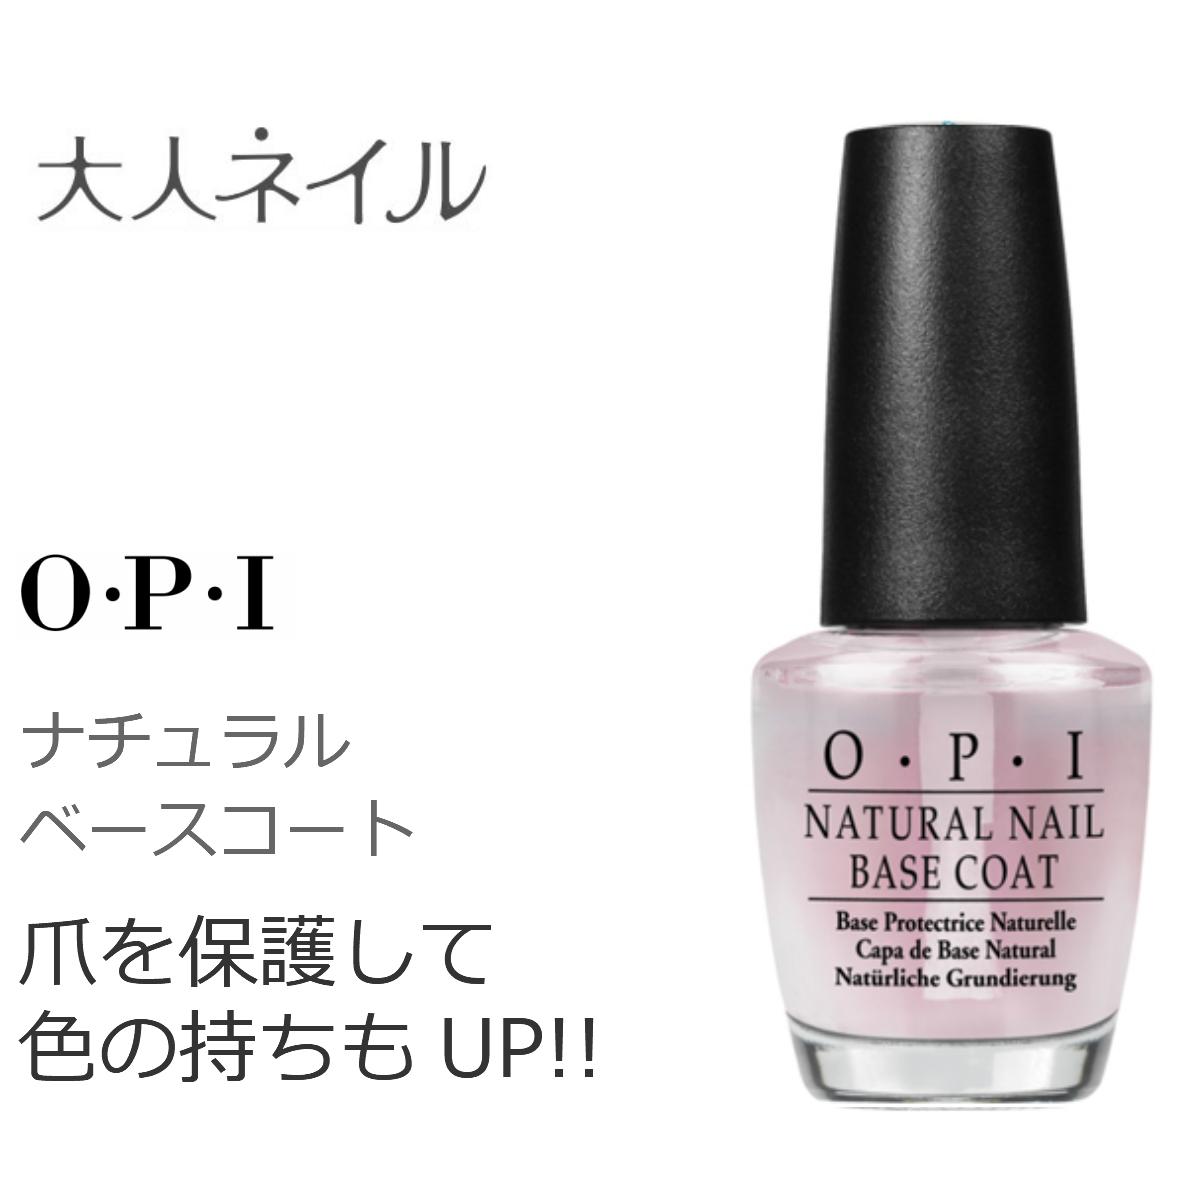 OPI(オーピーアイ)ベースコート